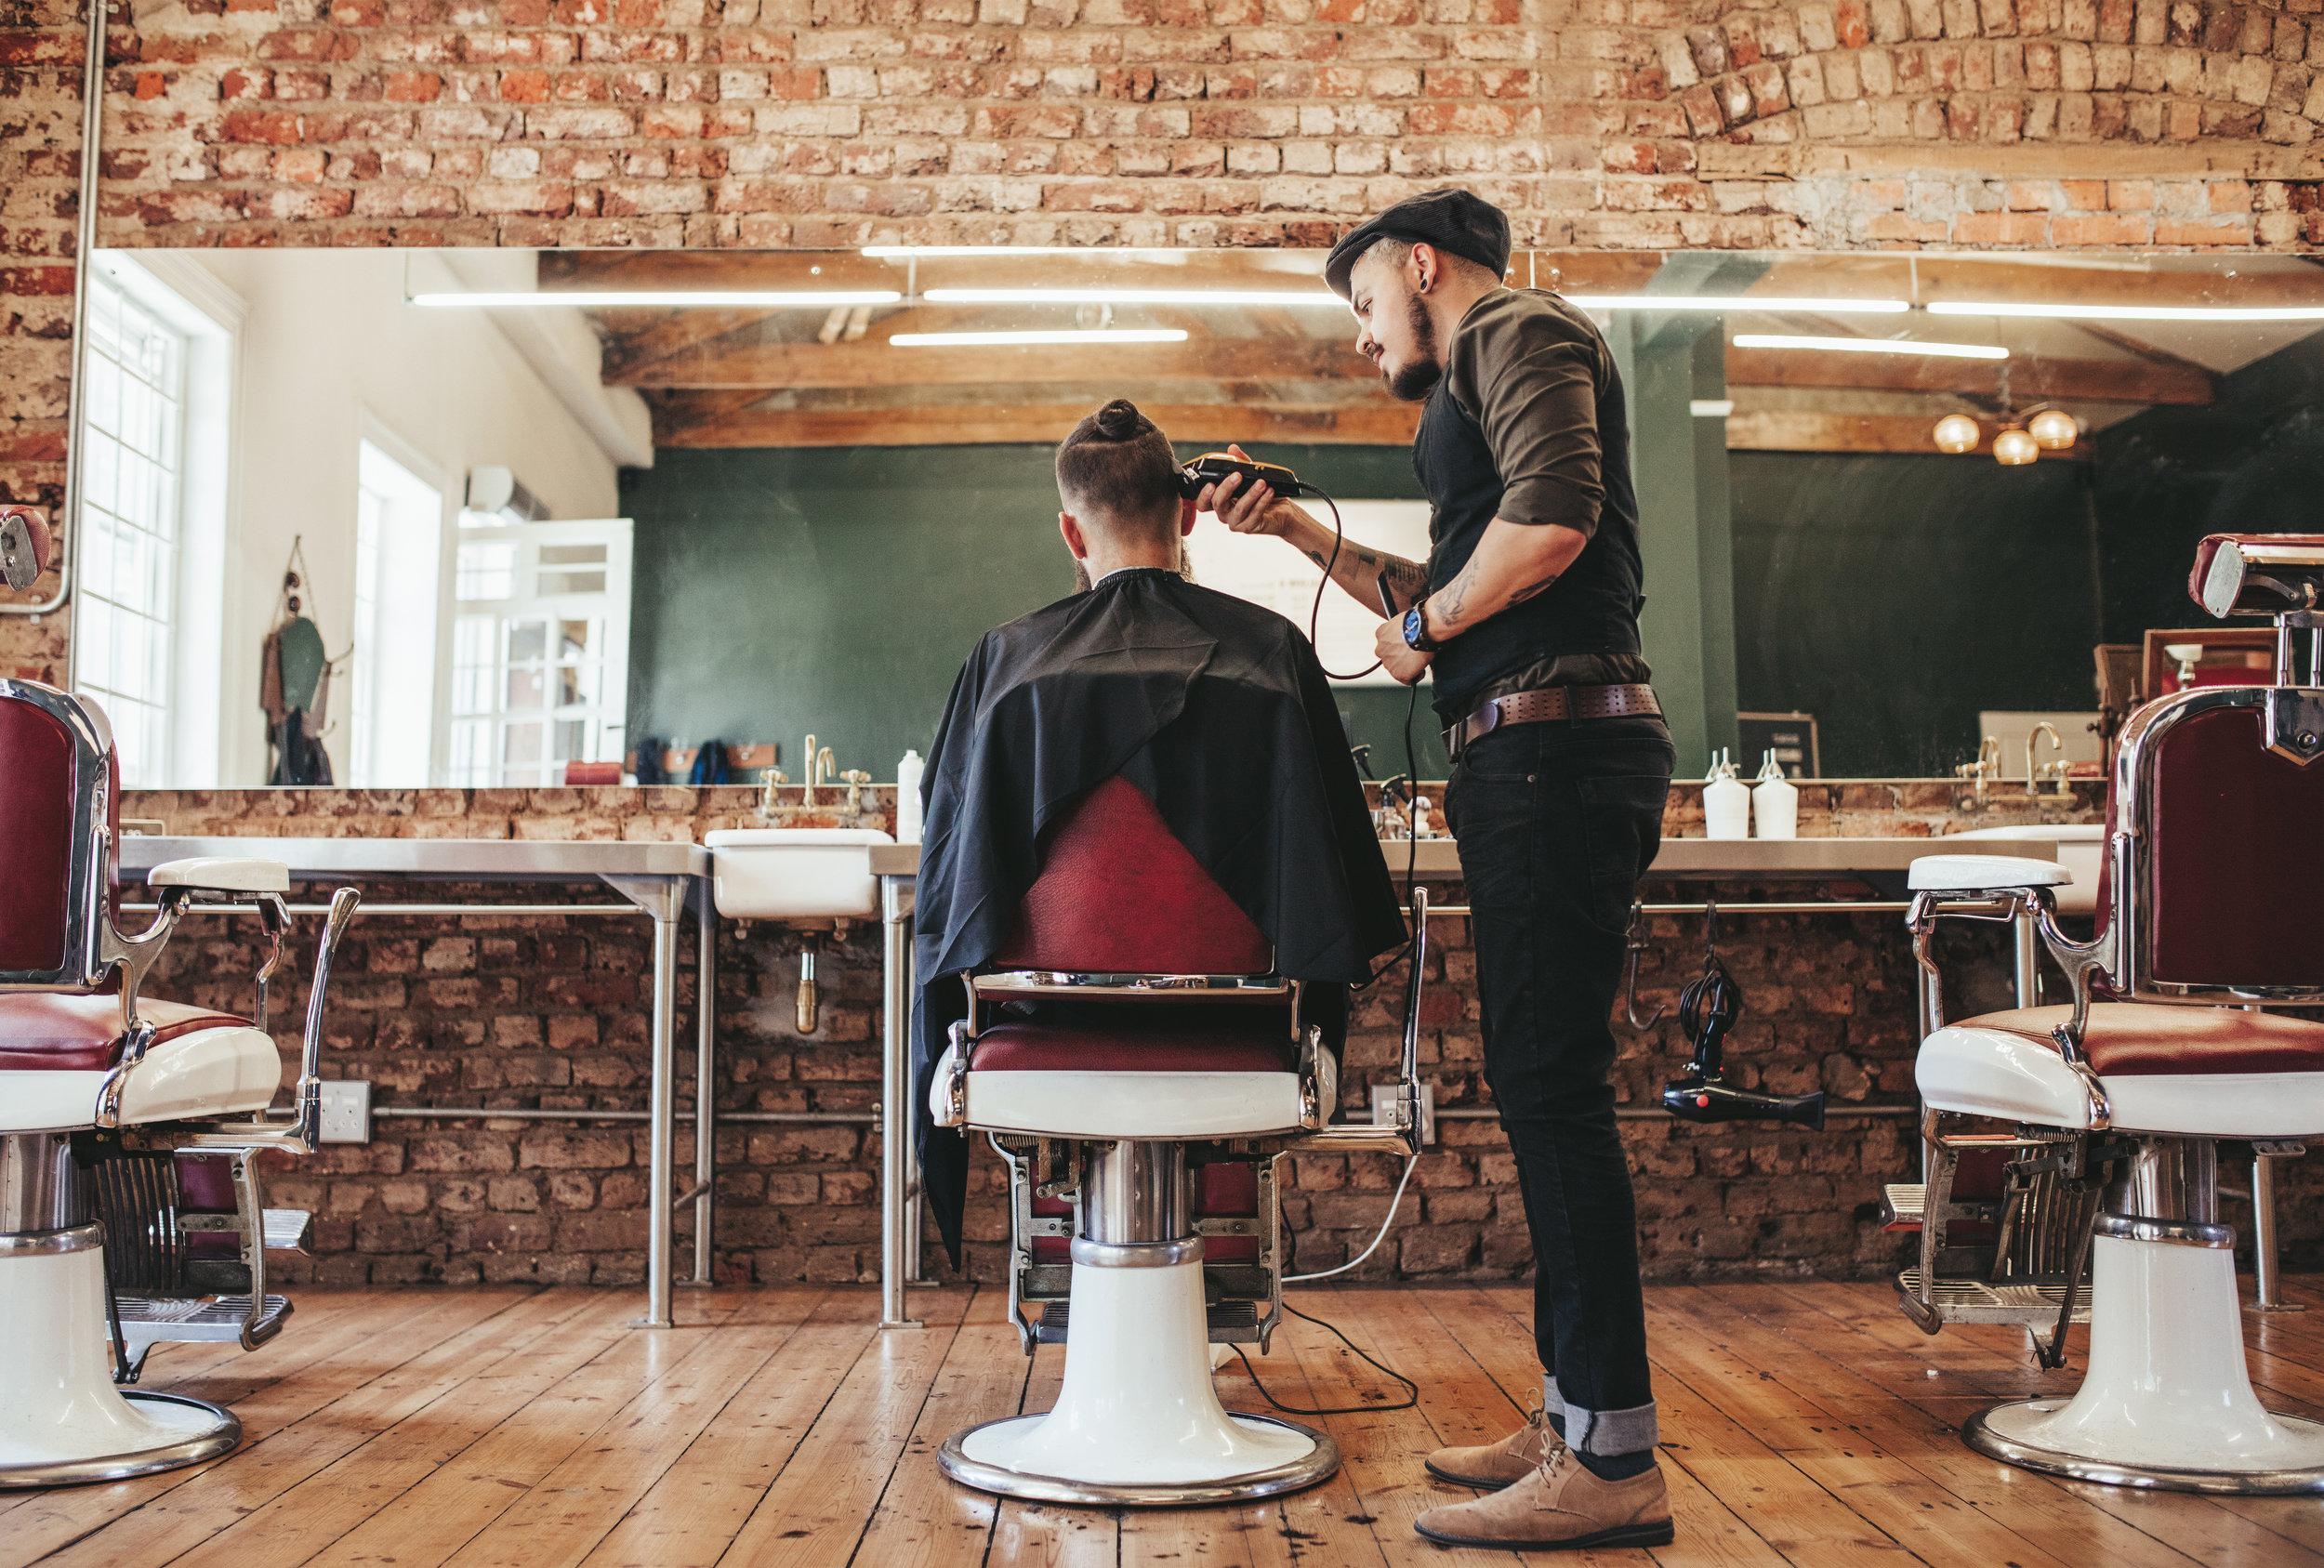 klipped-app-find-right-barber-hair-stylist.jpg